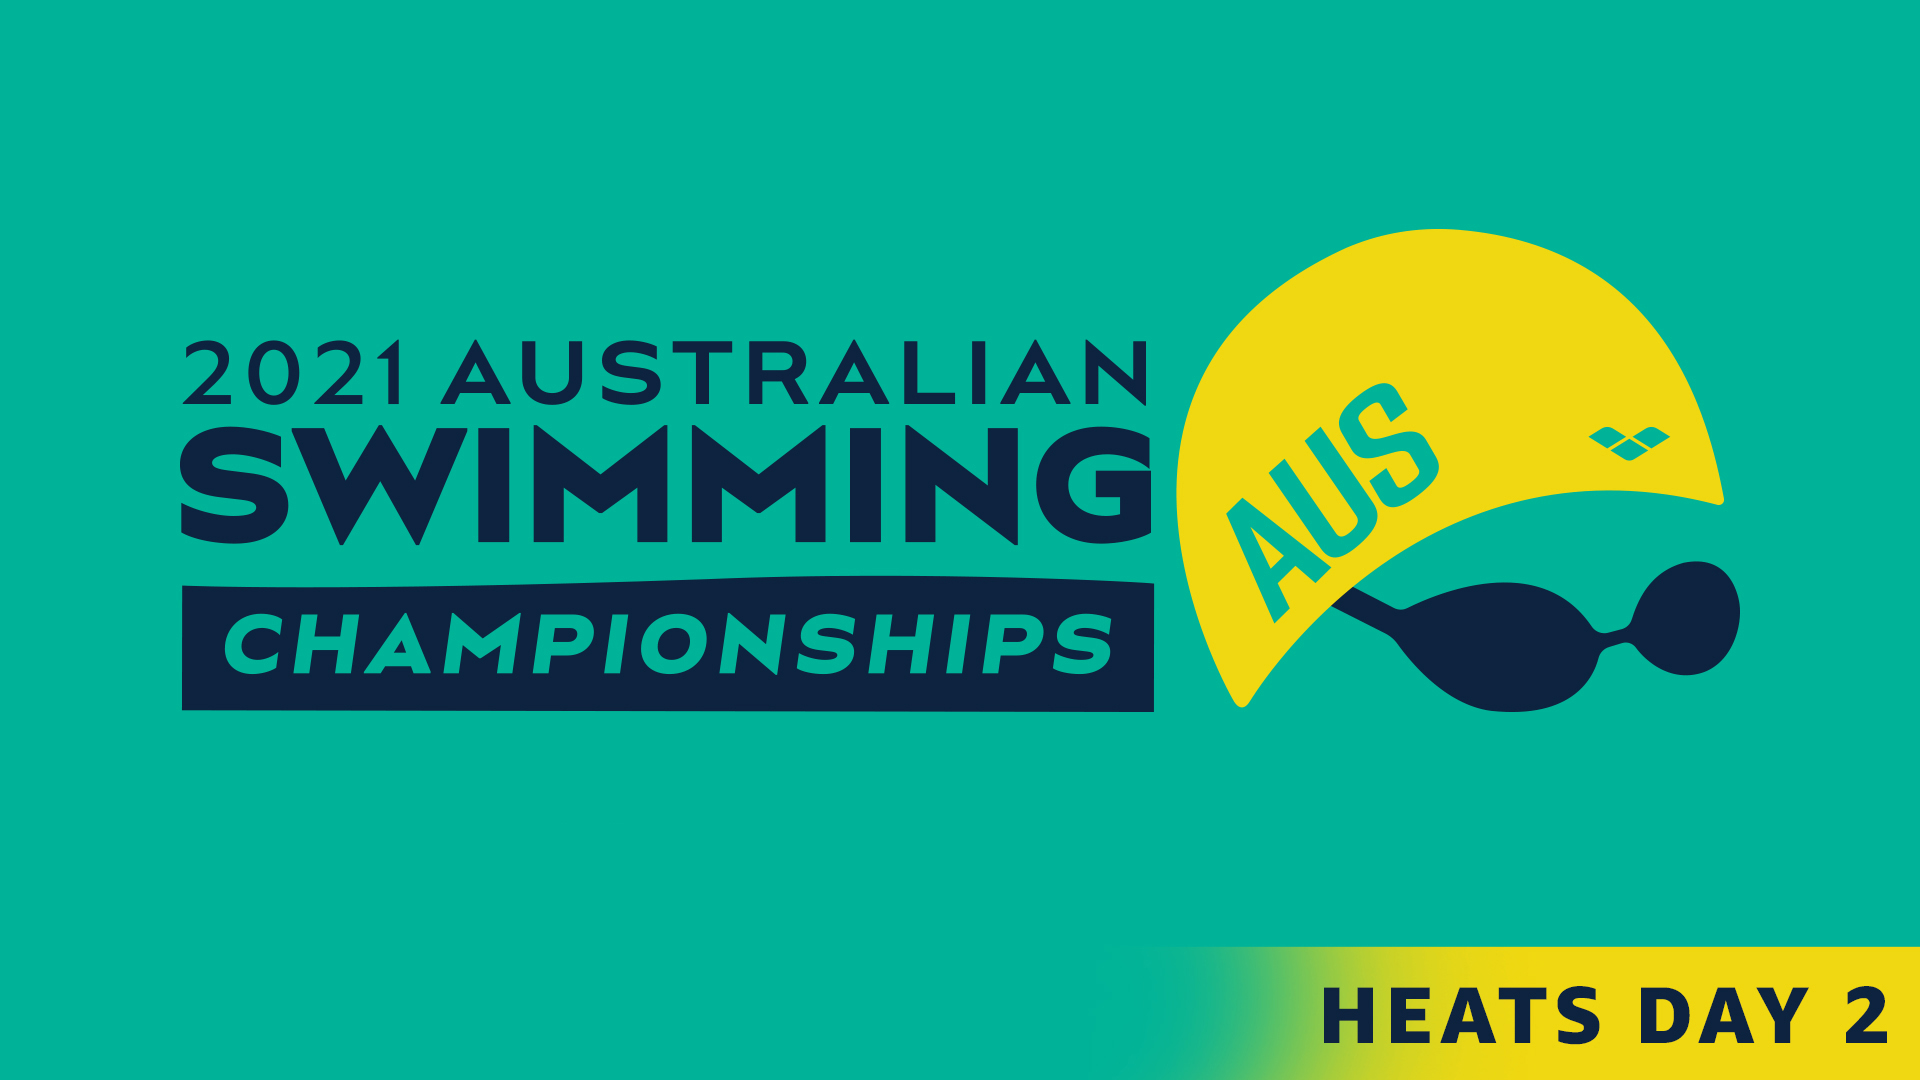 Australian Swimming Championships: Day 2 Heats